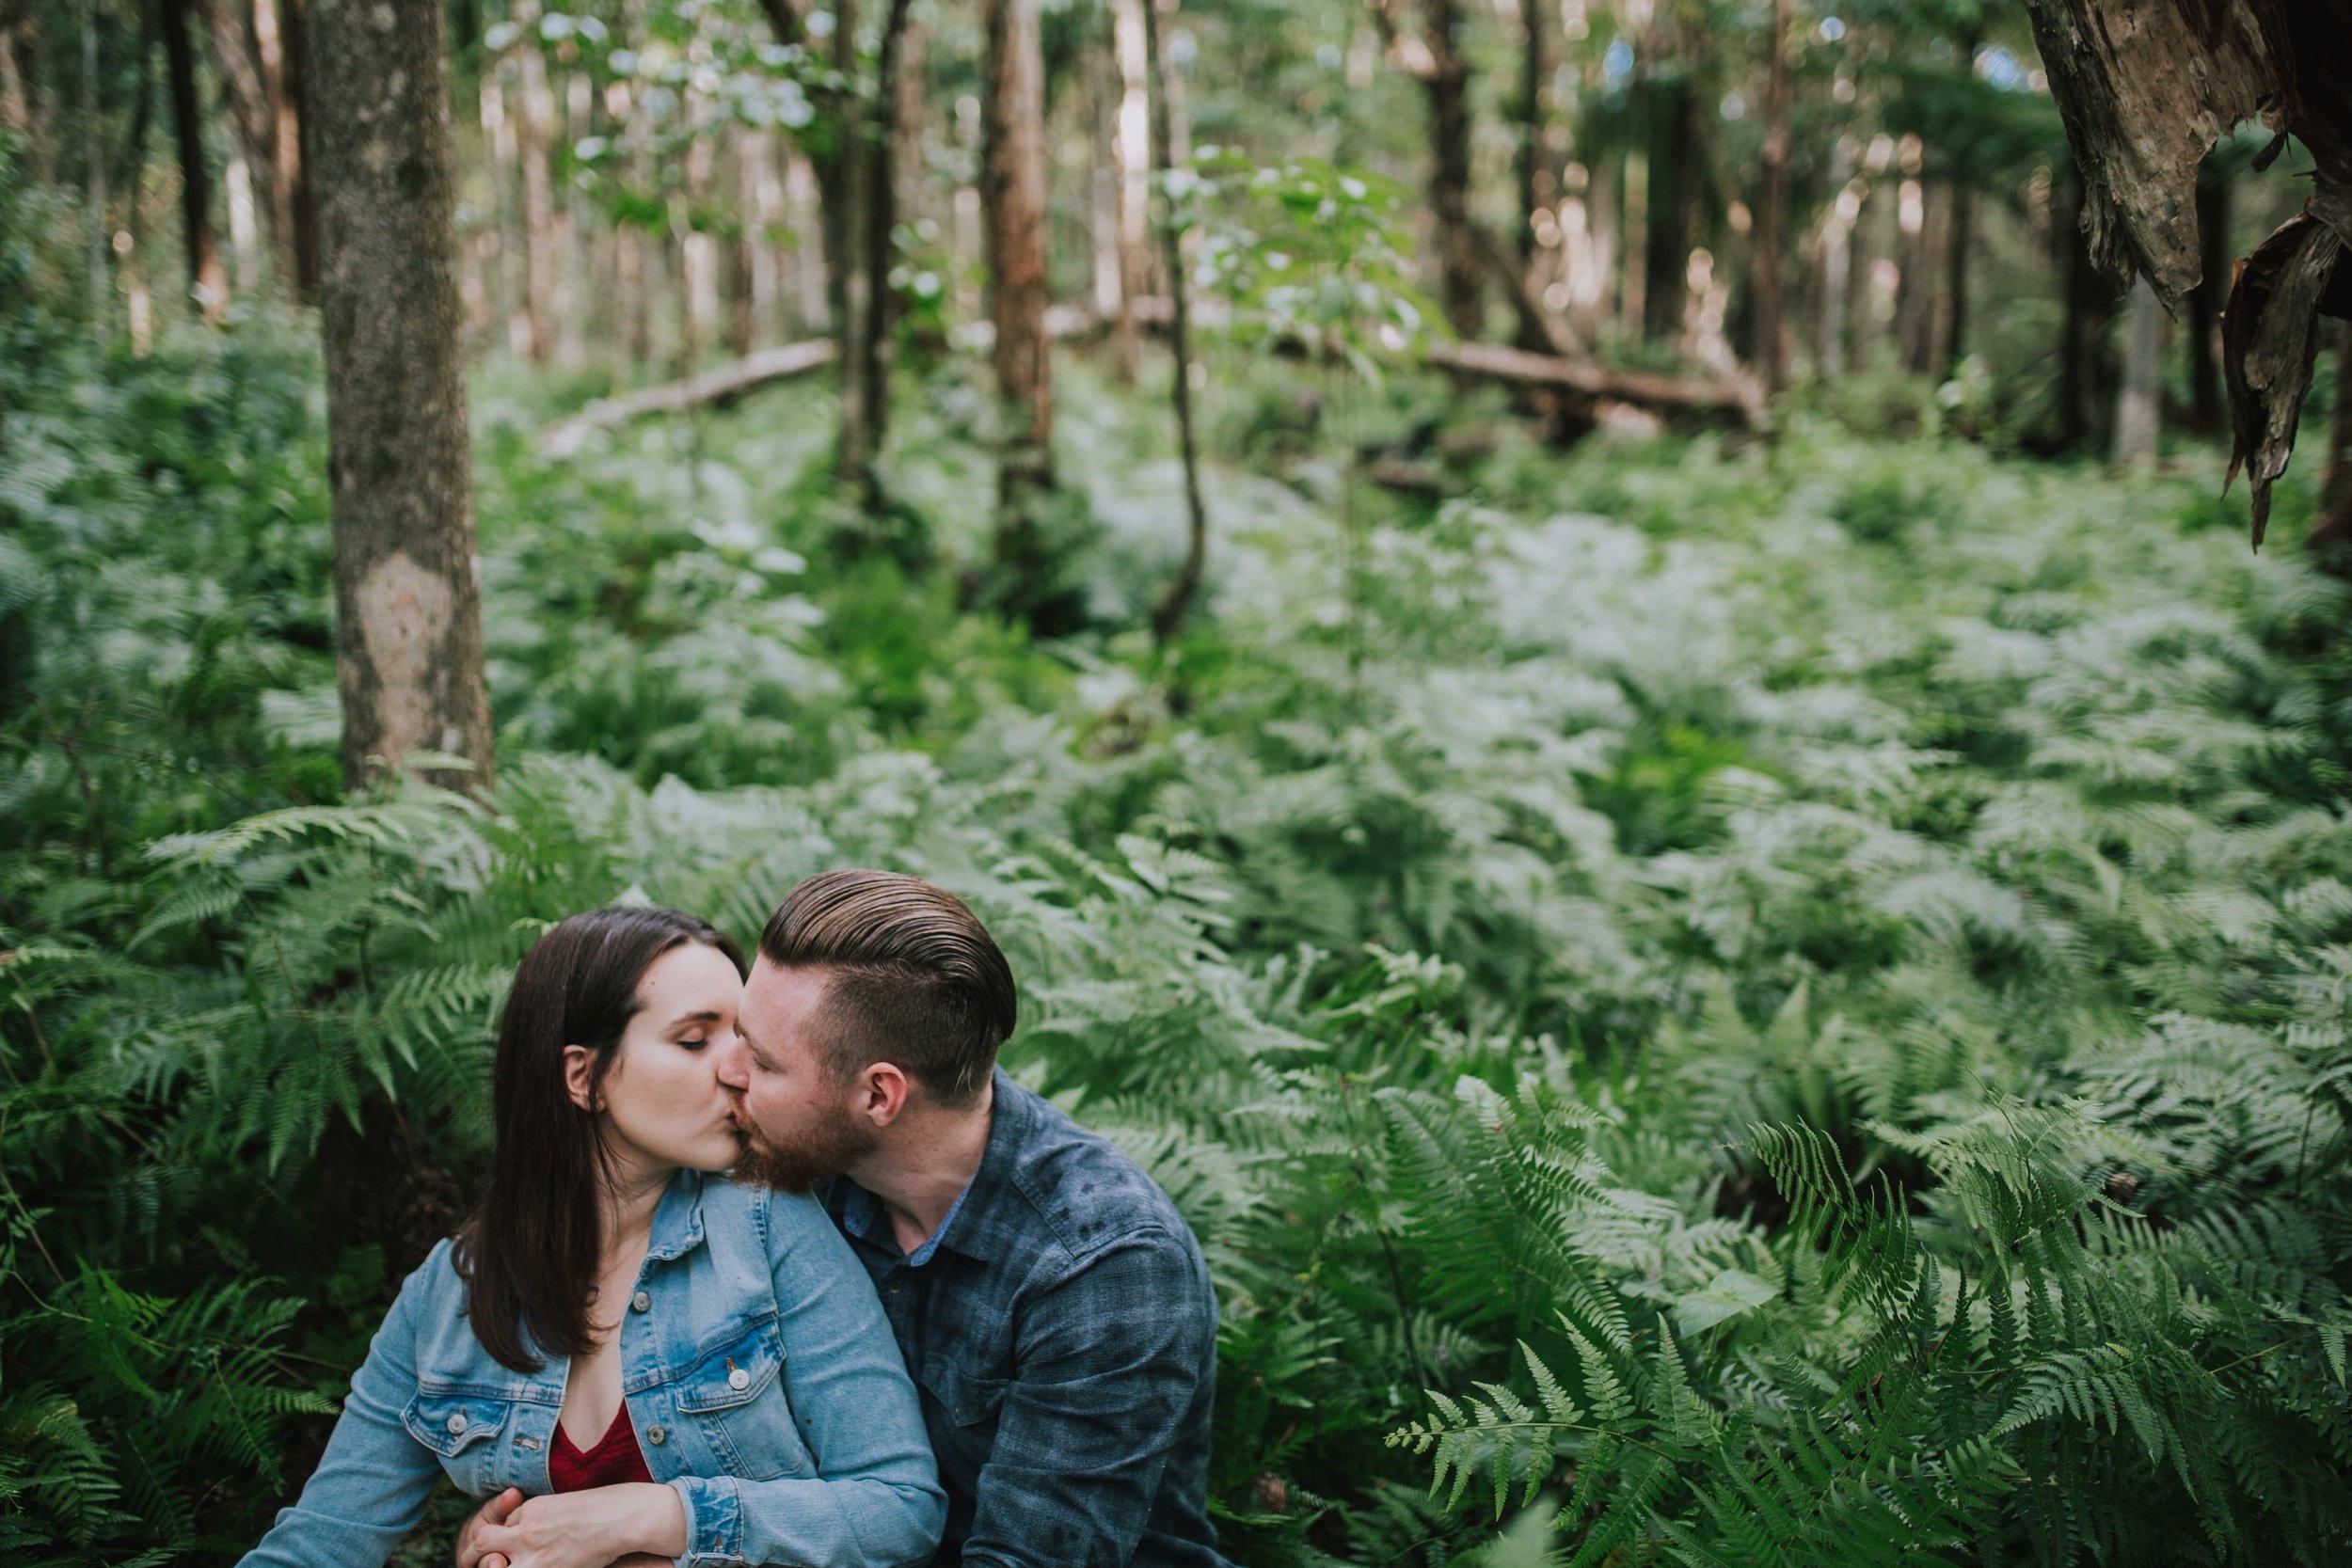 Brisbane Wedding Photographer.Engagements (19 of 22).jpg